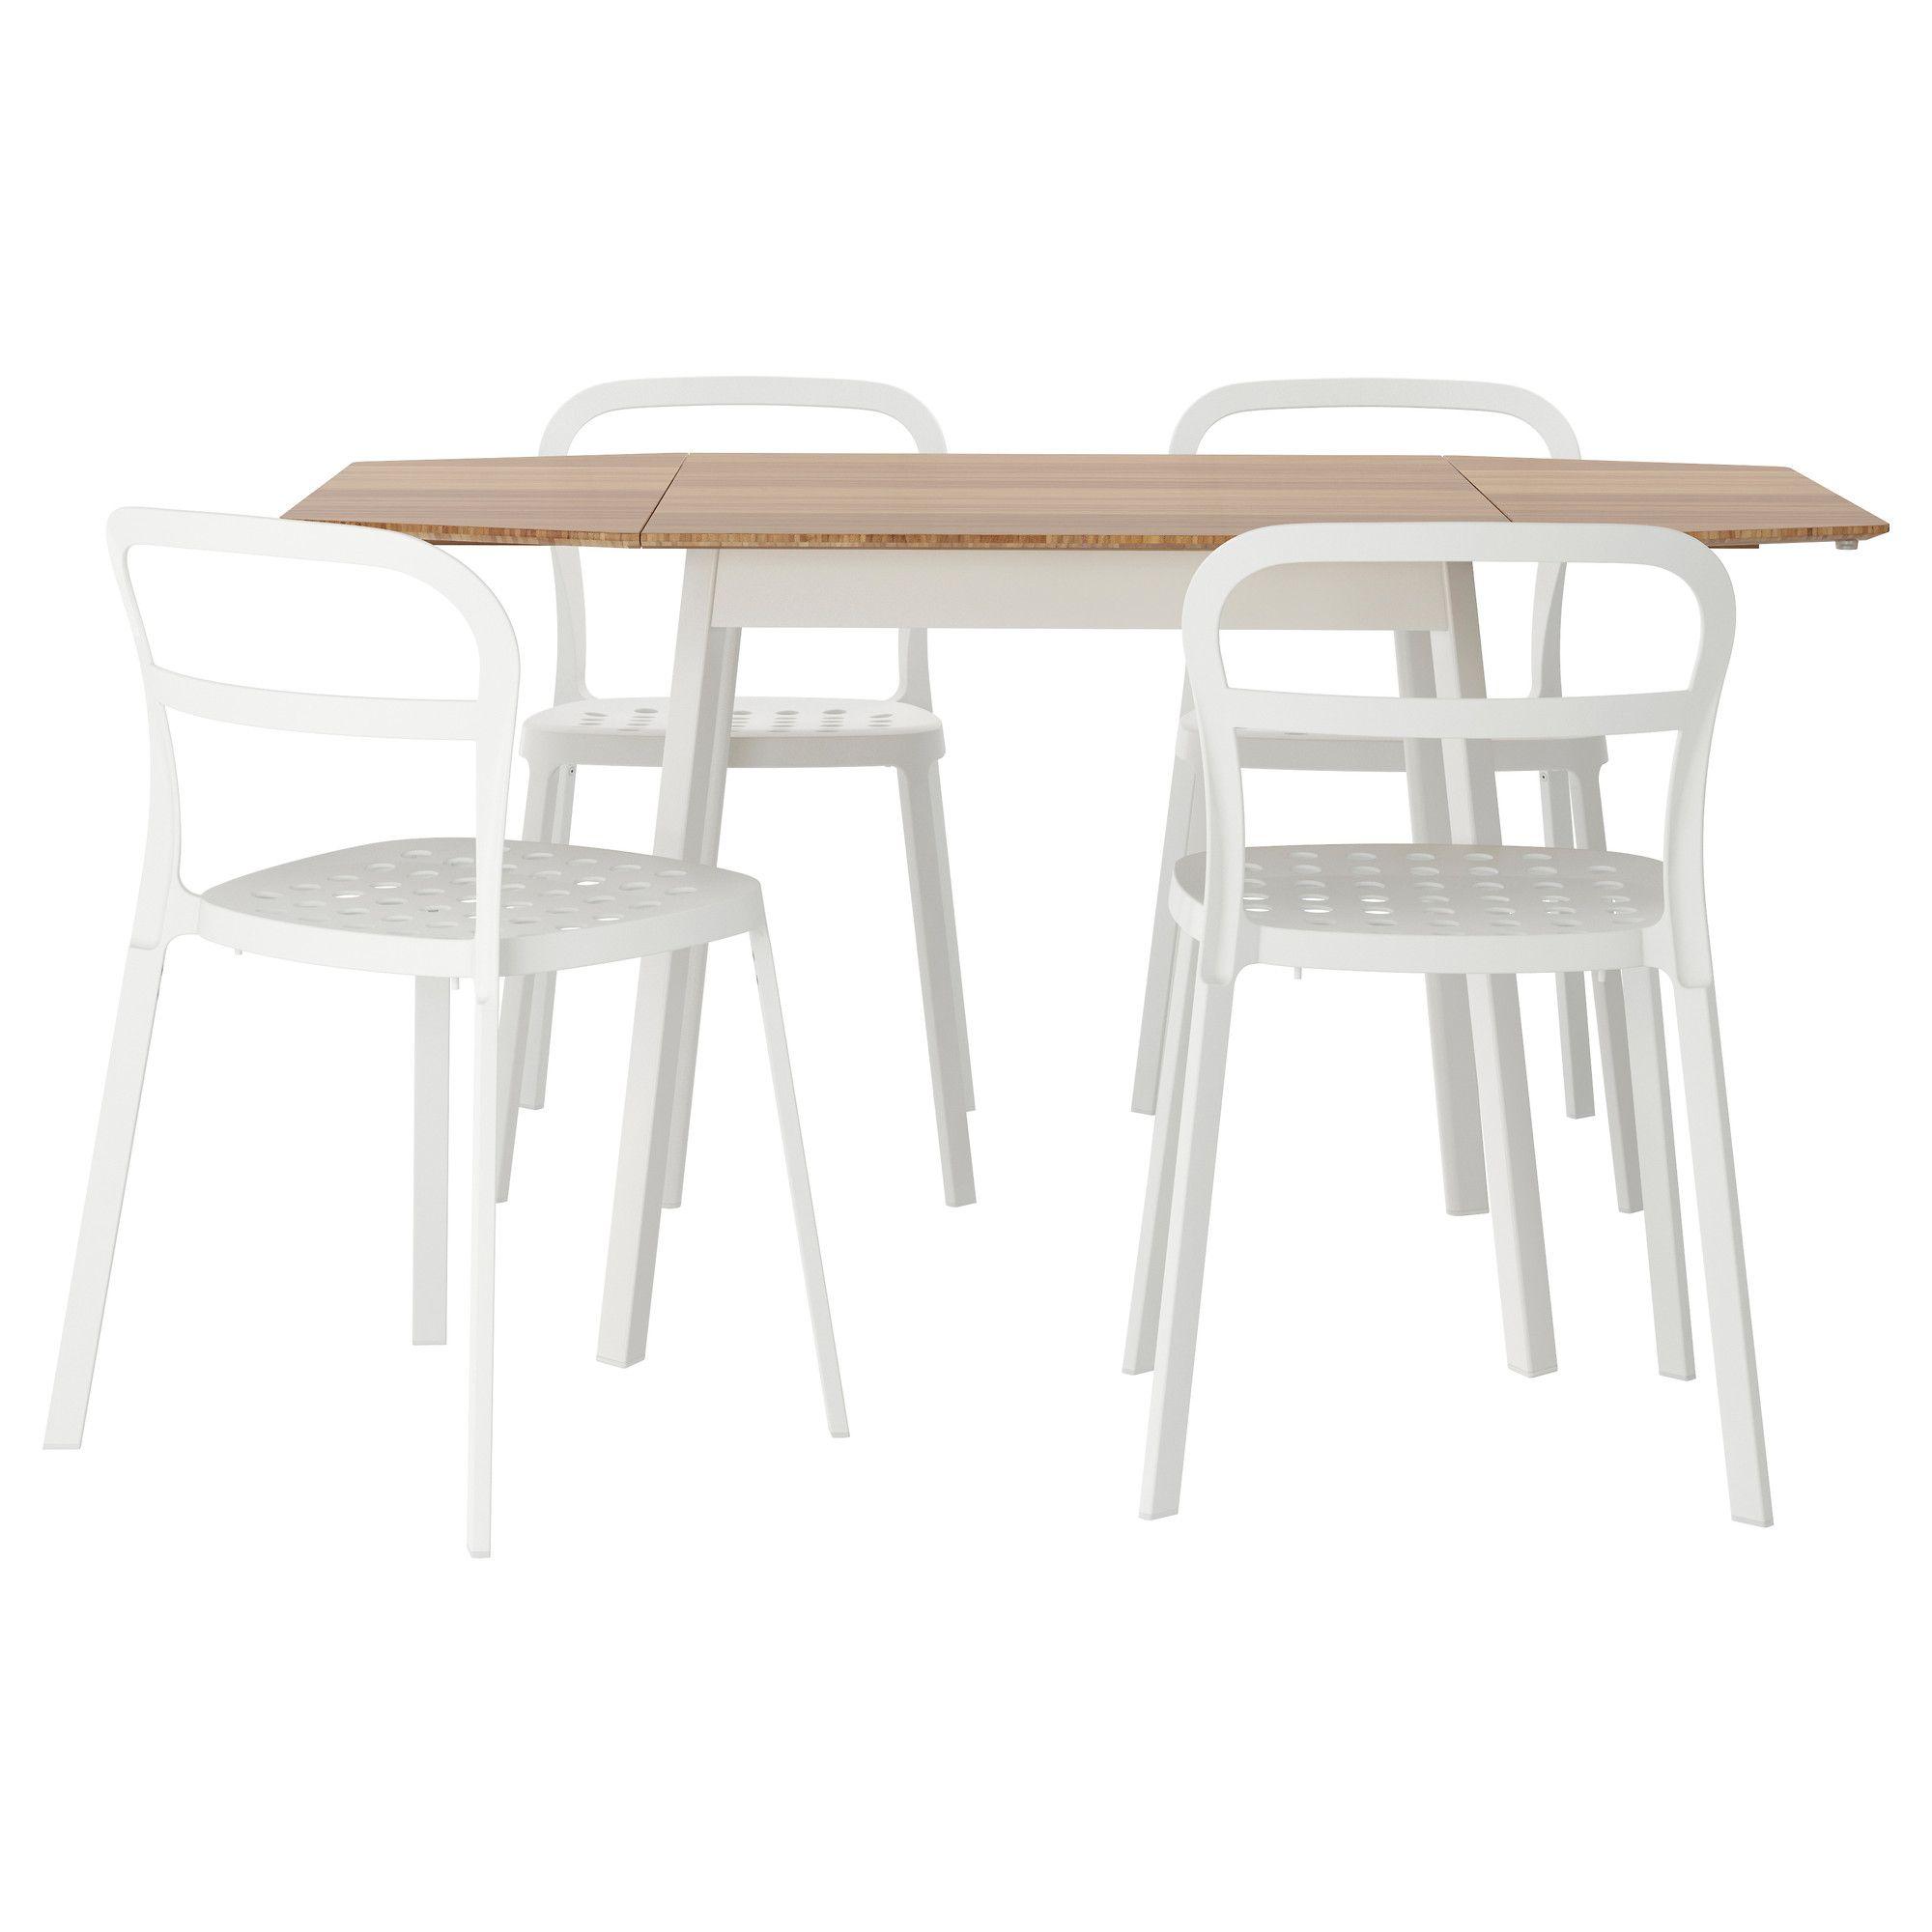 ikea ps reidar table and chairs ikea